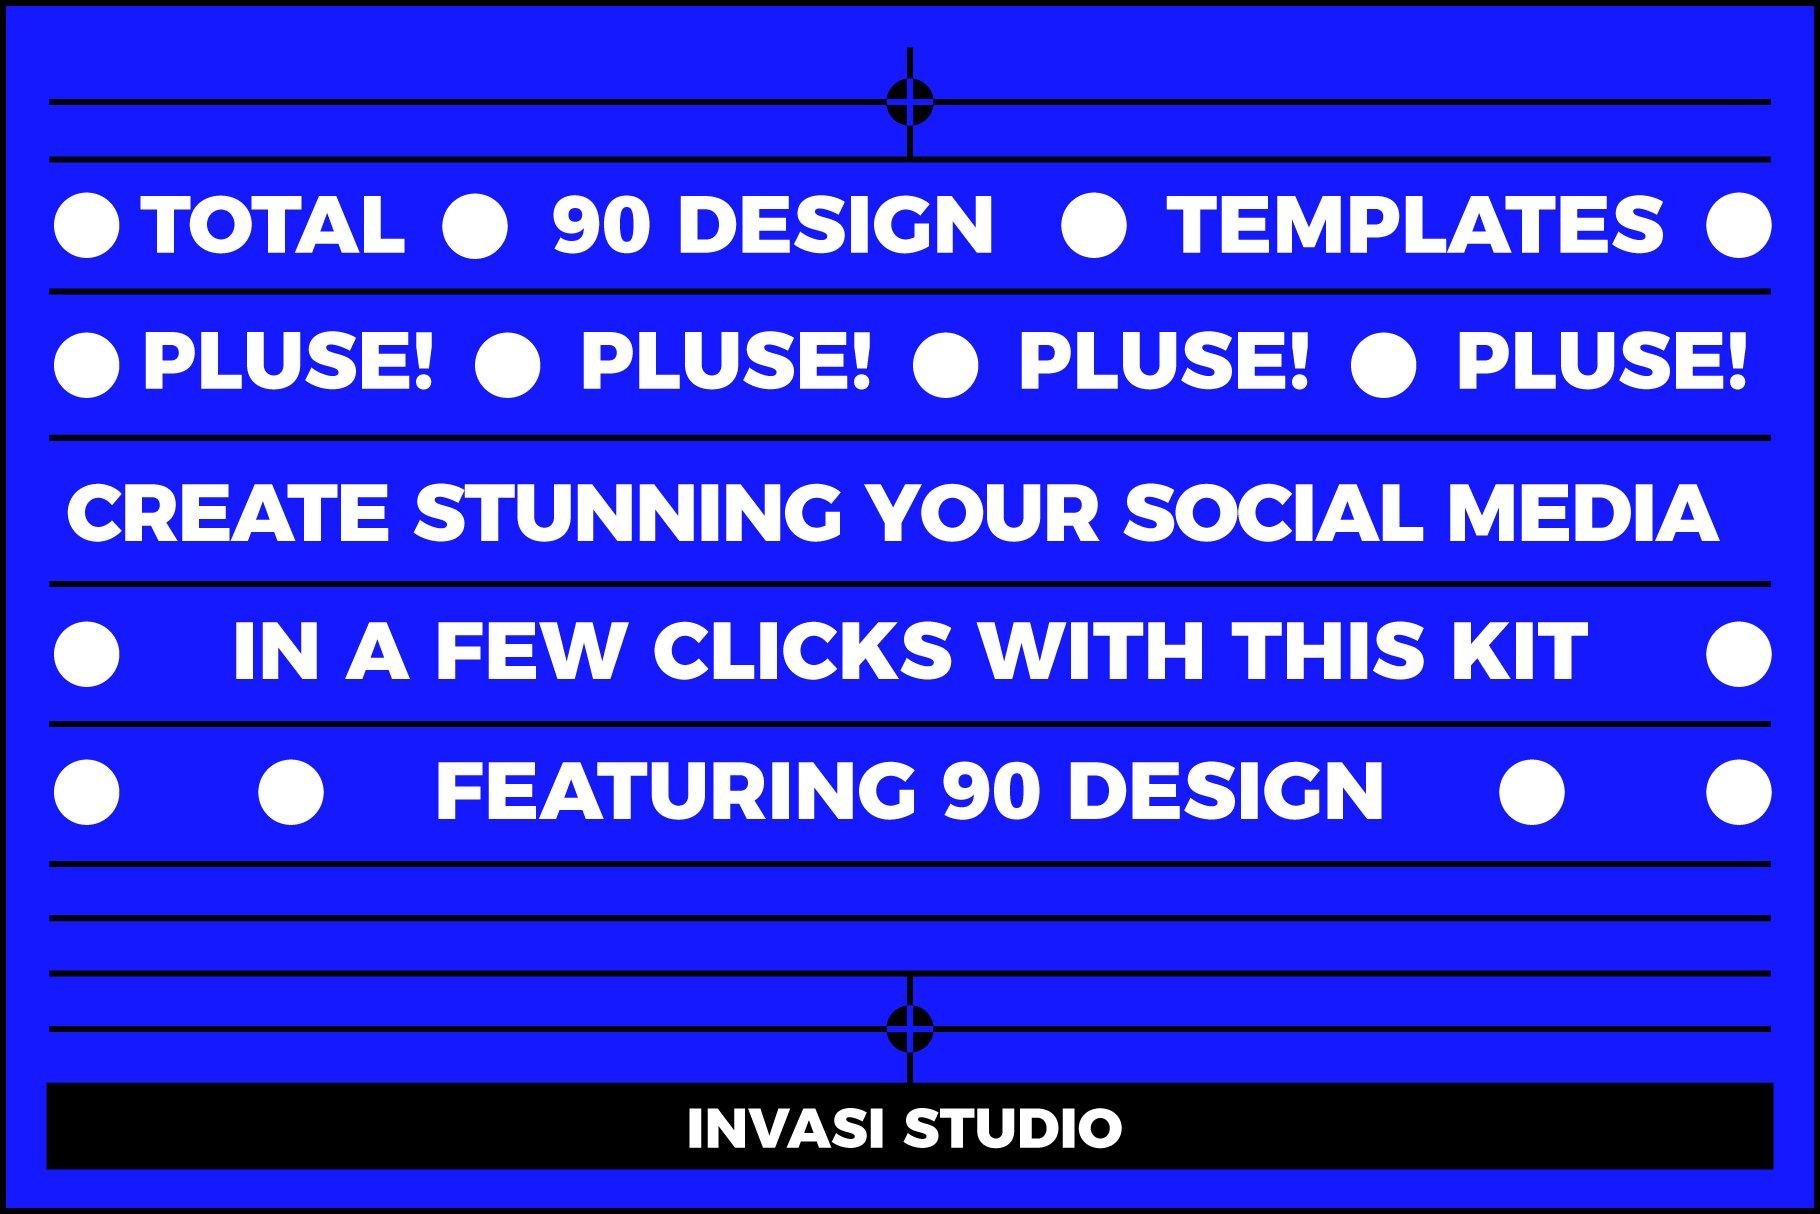 pluse! preview marketplace creative market 02 3